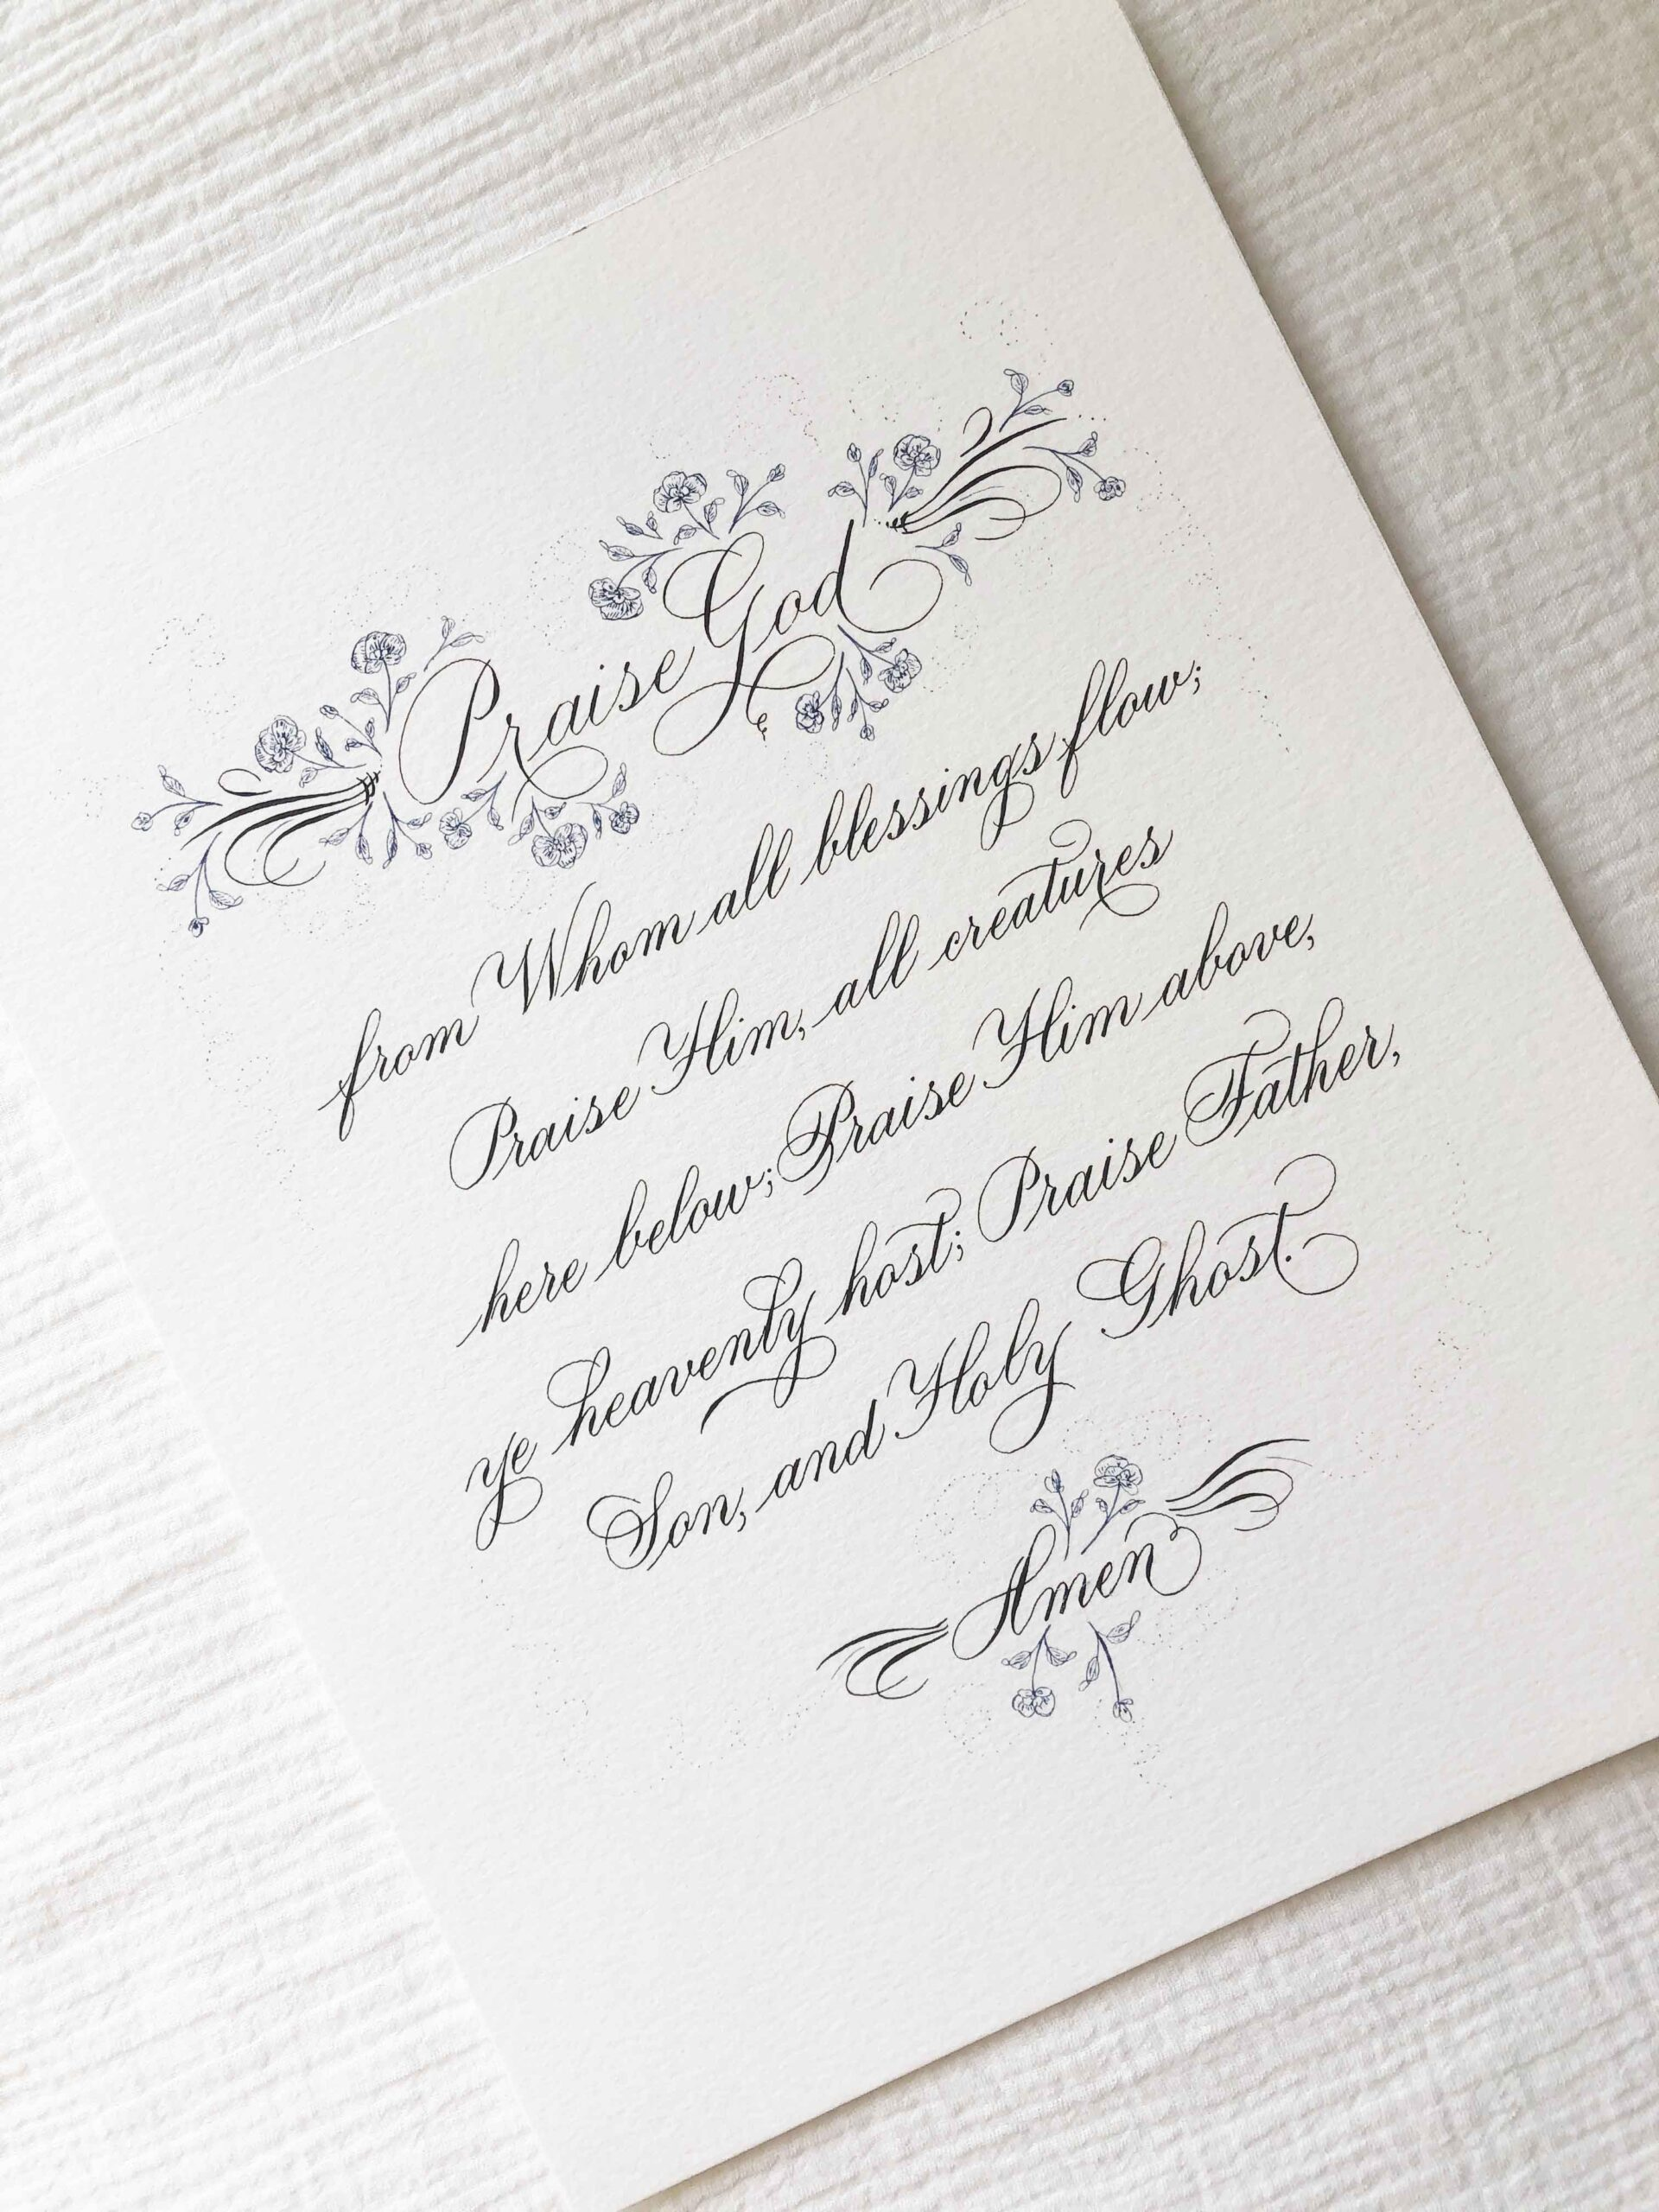 Allocco Design Norfolk, VA Calligraphy | Calligraphy Doxology